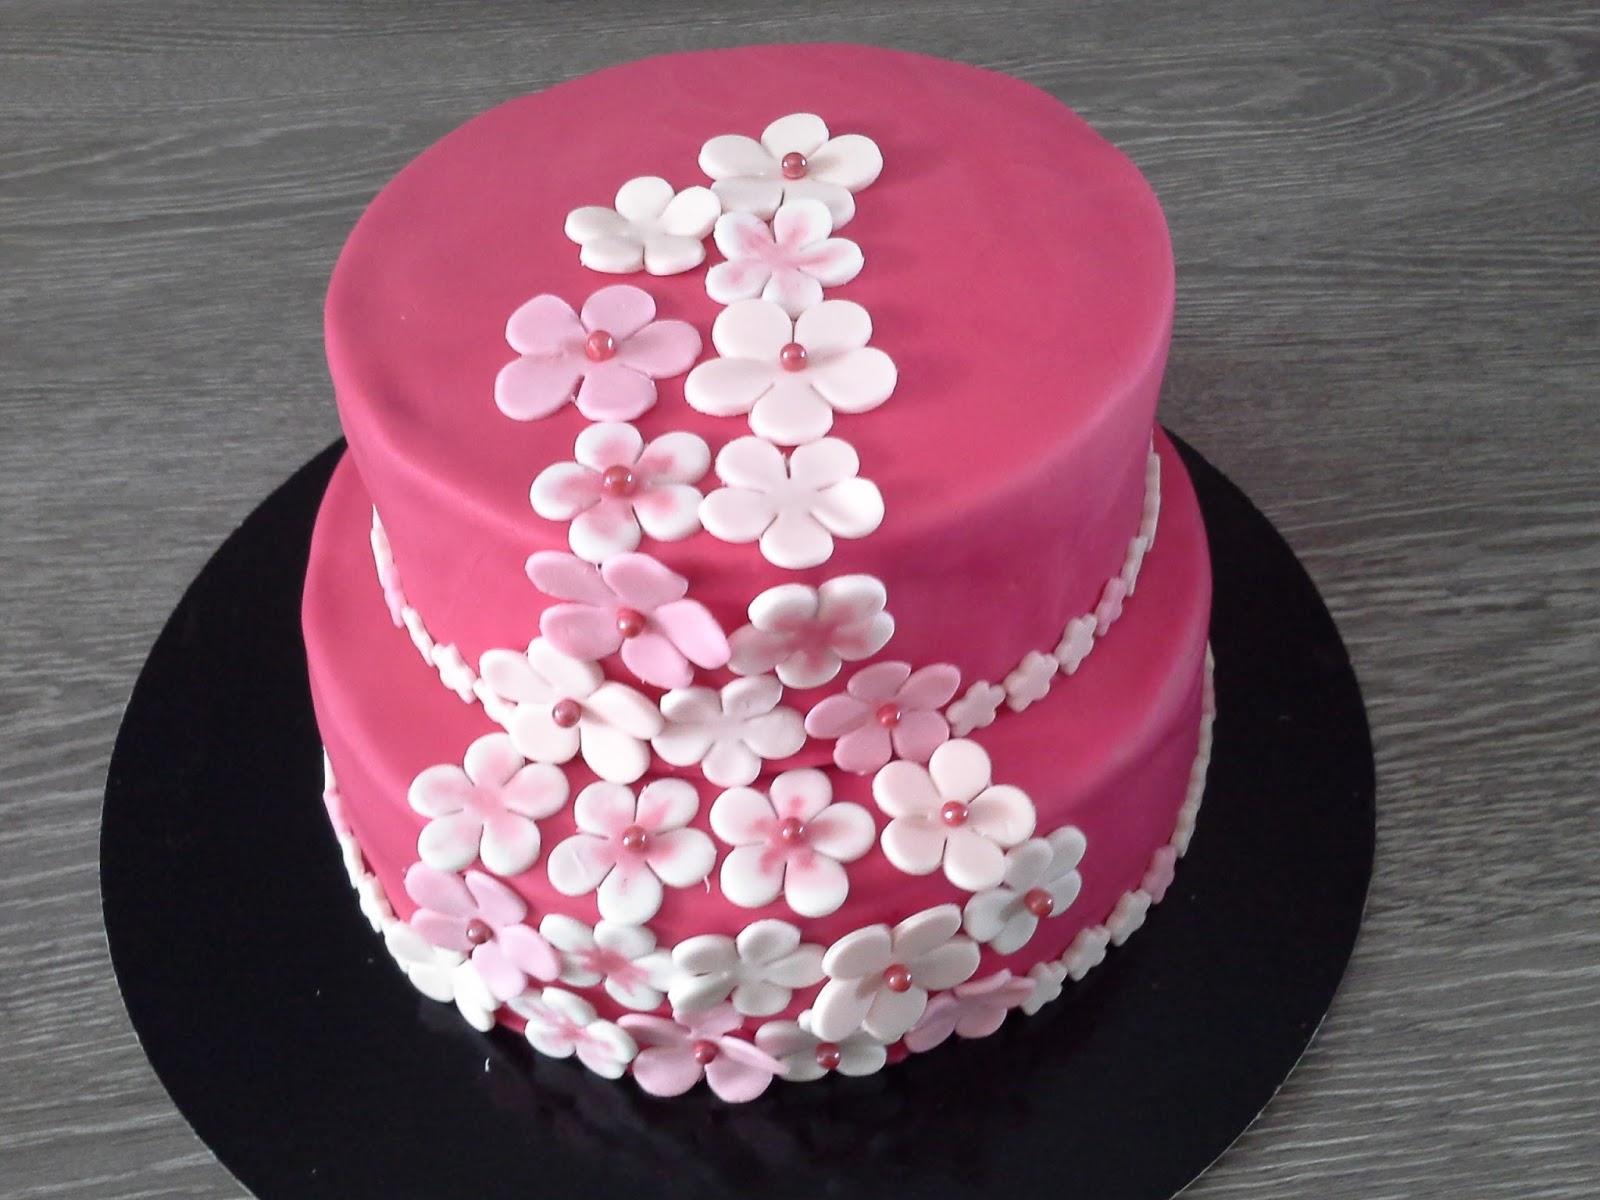 Sponge Cake Chocolat Curd Framboise